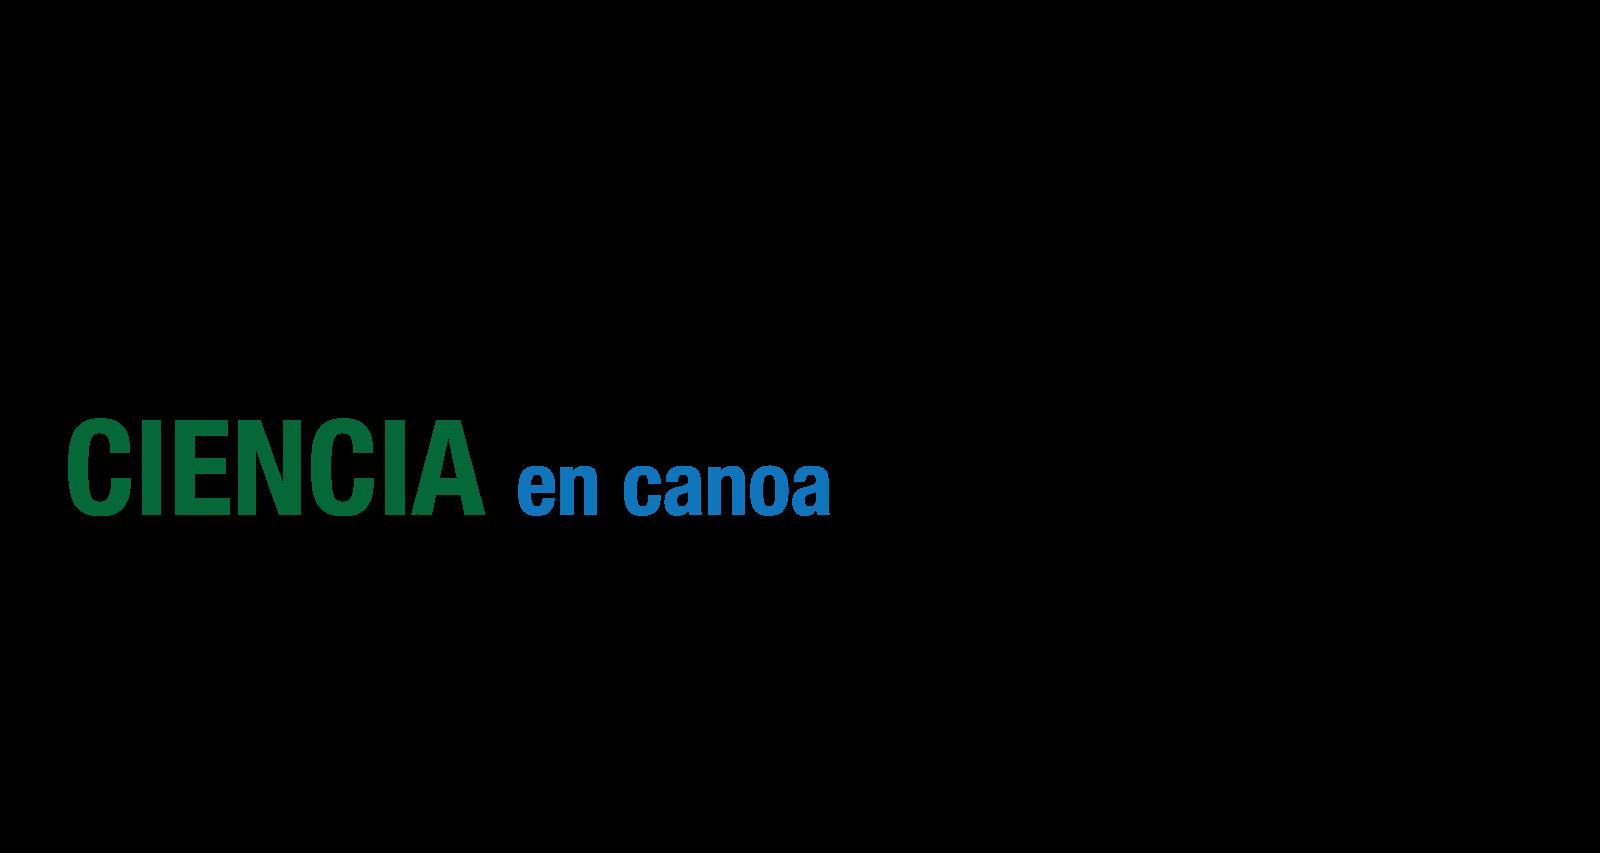 Ciencia en Canoa, by Vanessa Restrepo Schild.